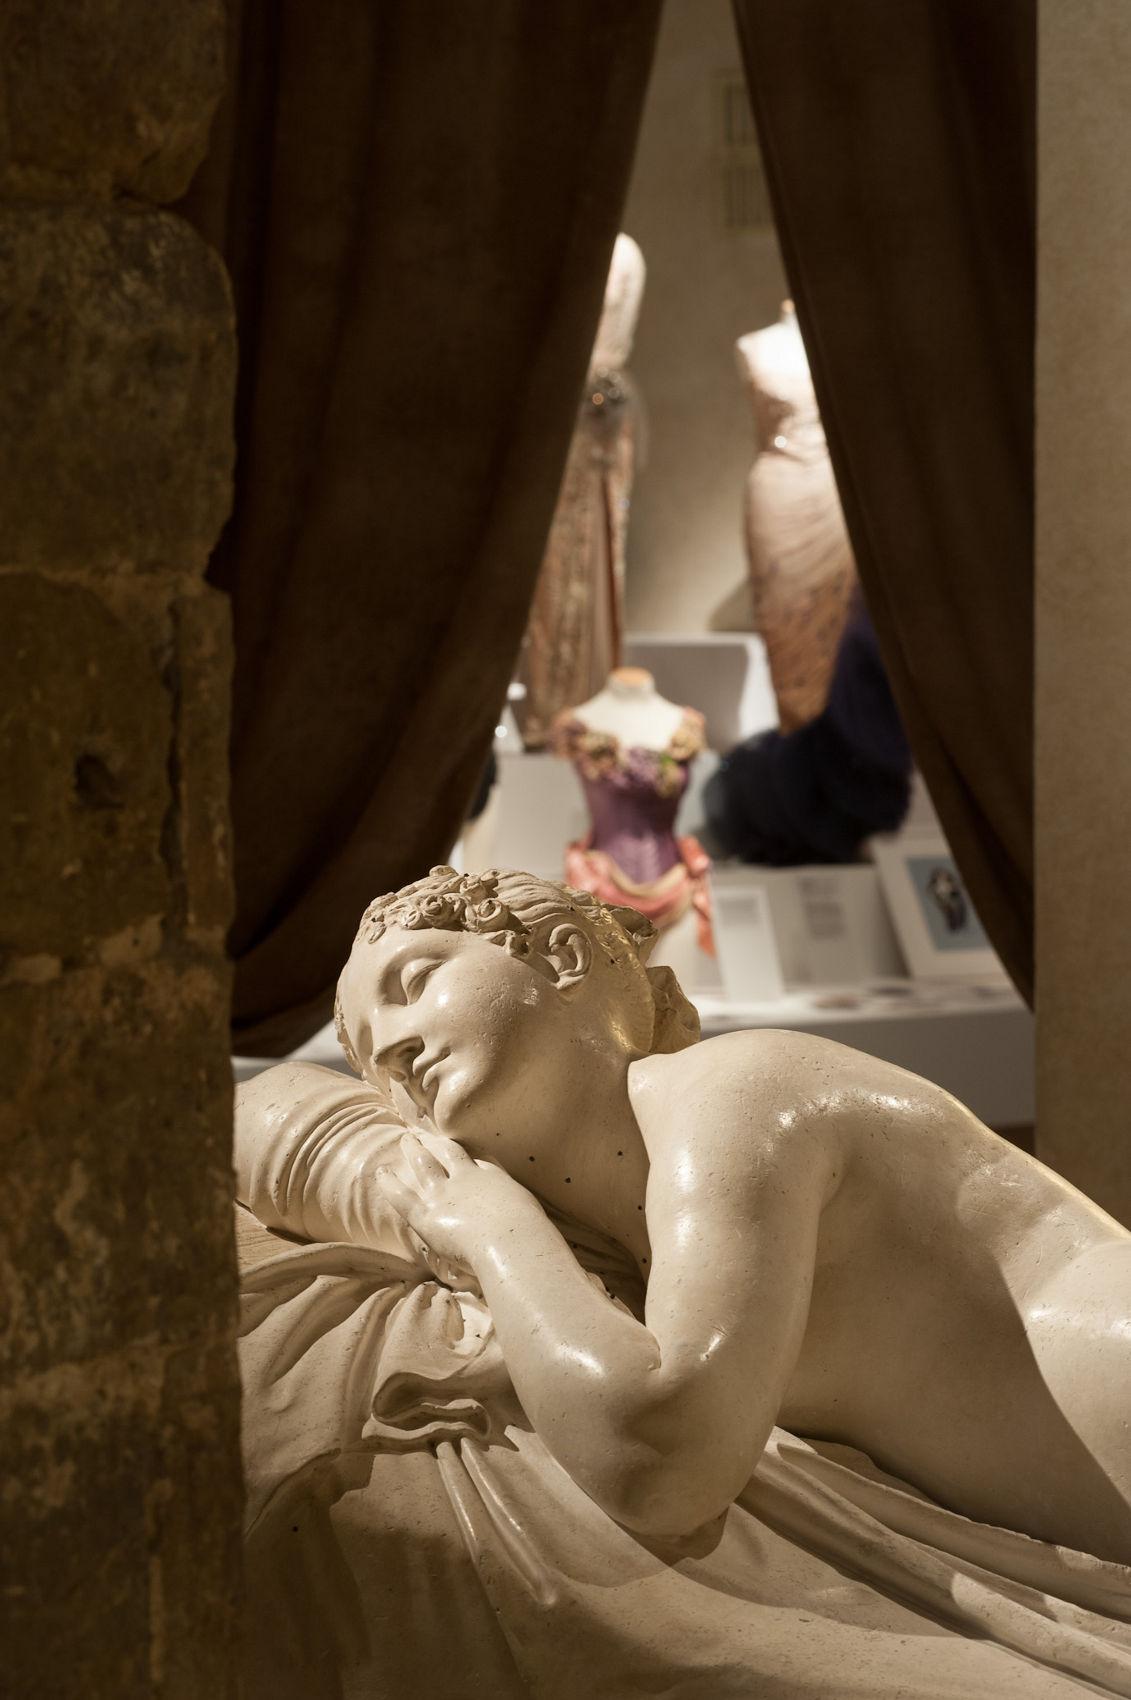 Salvatore Ferragamo Exhibition dedicated to Marilyn Monroe Salvatore Ferragamo Museum Woman Statue Details